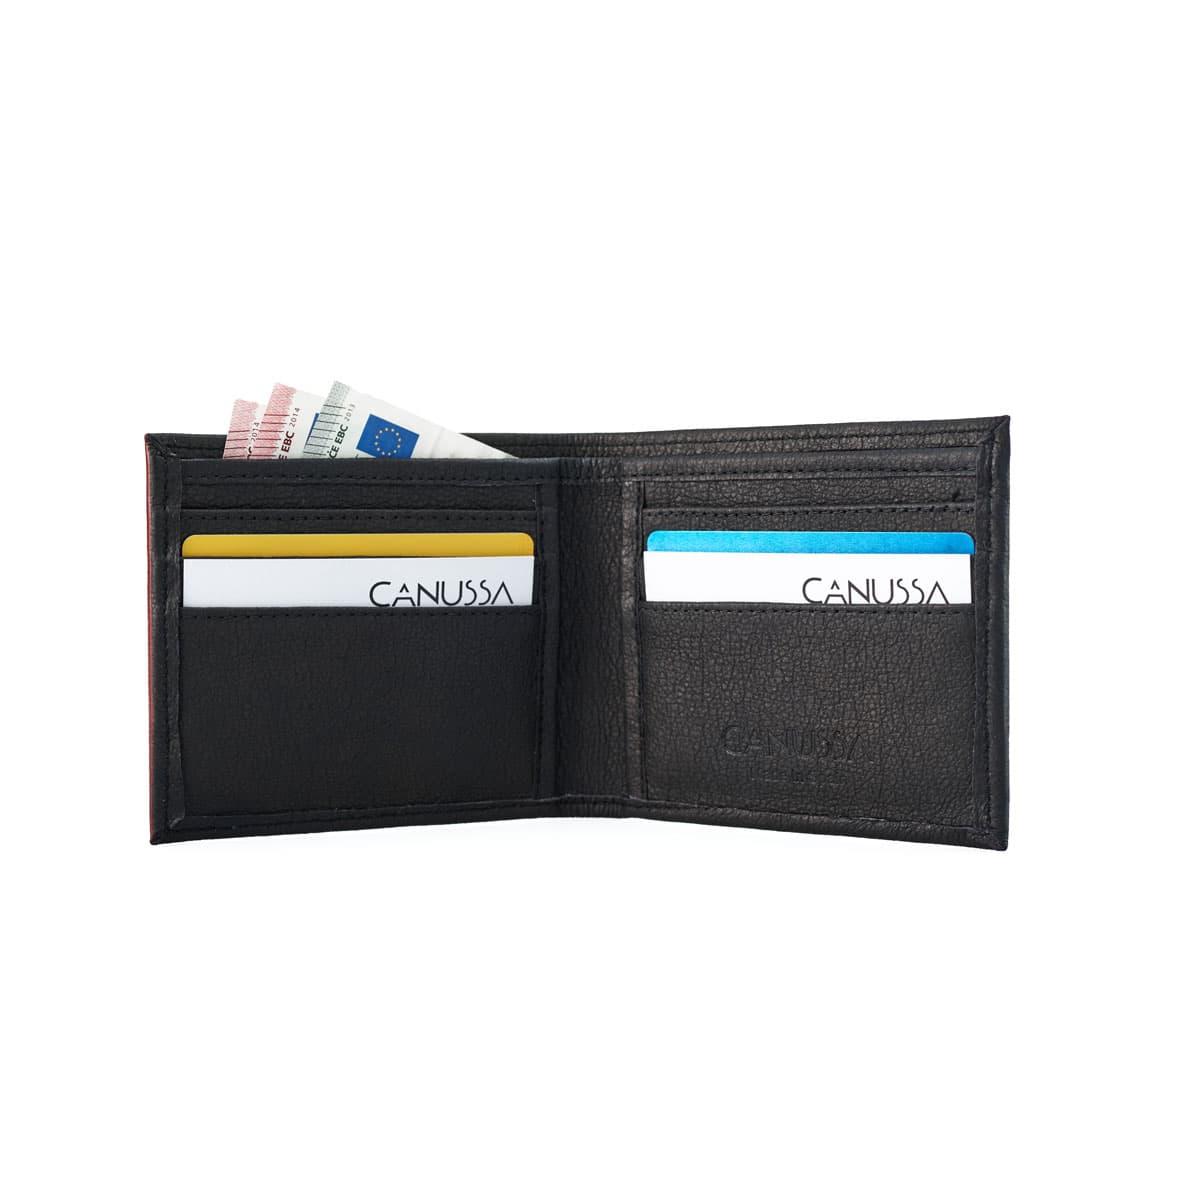 Cartera billetera abierta color negro